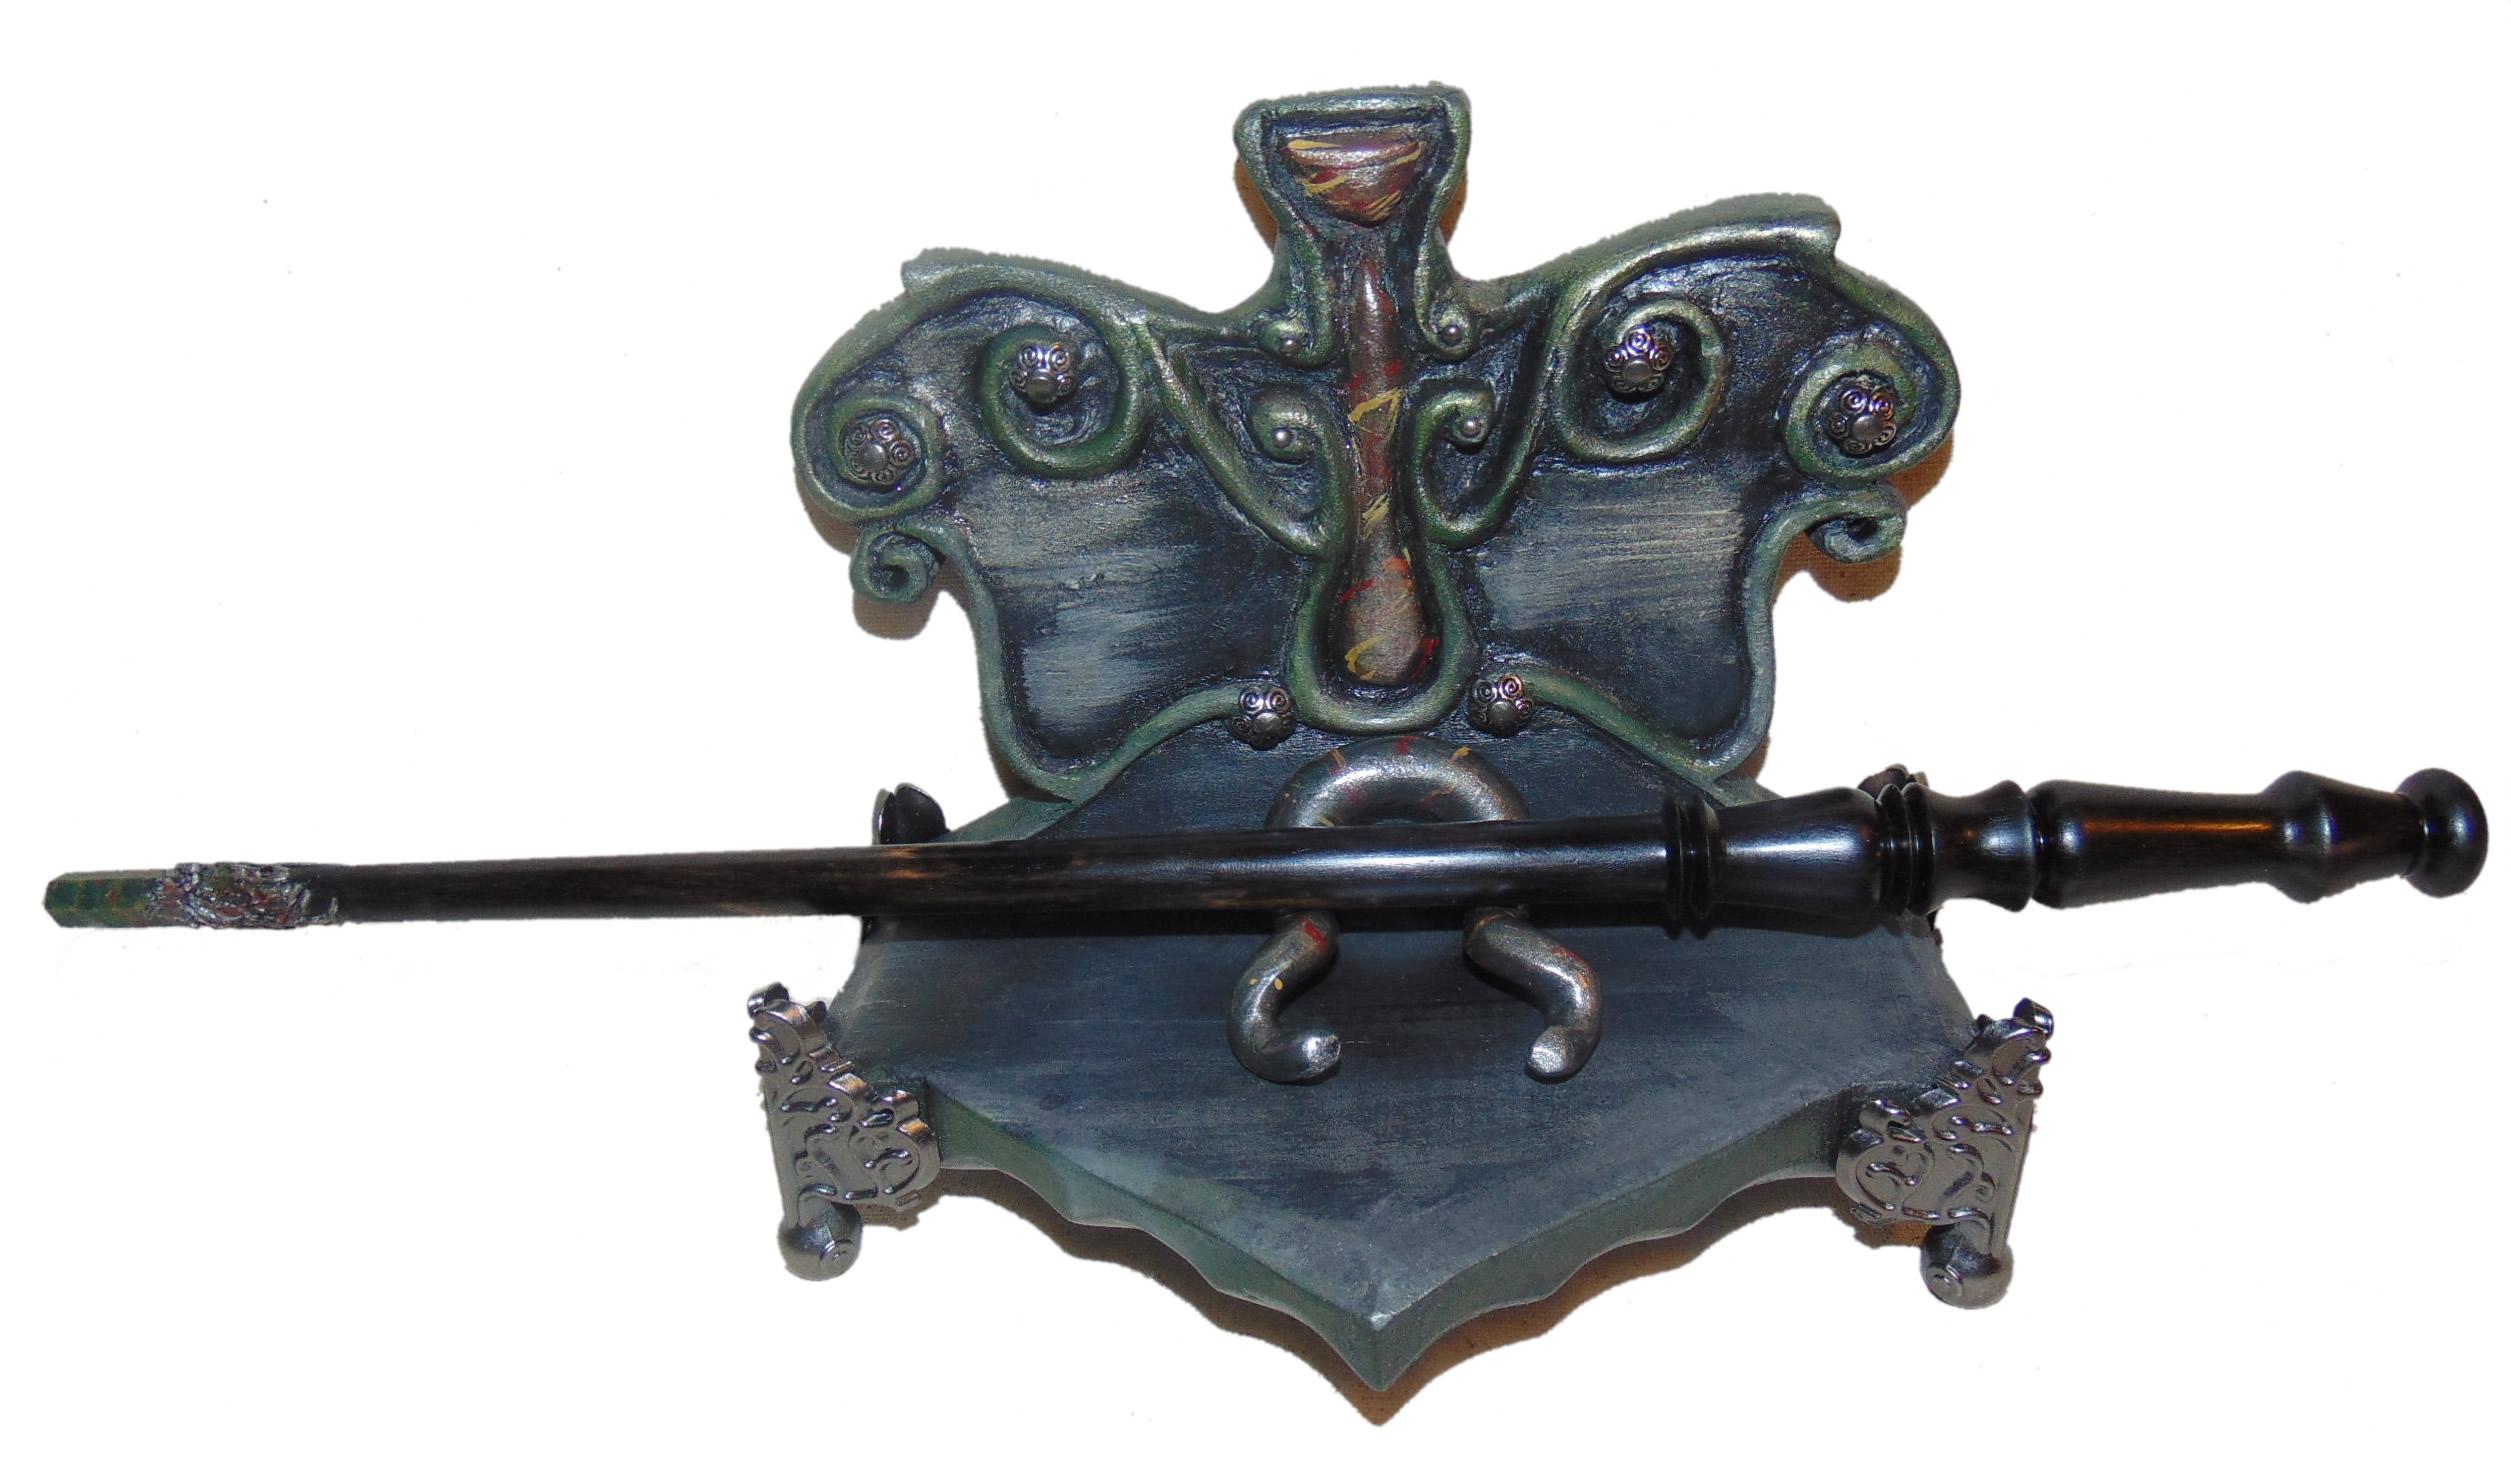 Amelia Lutkus custom wand and stand